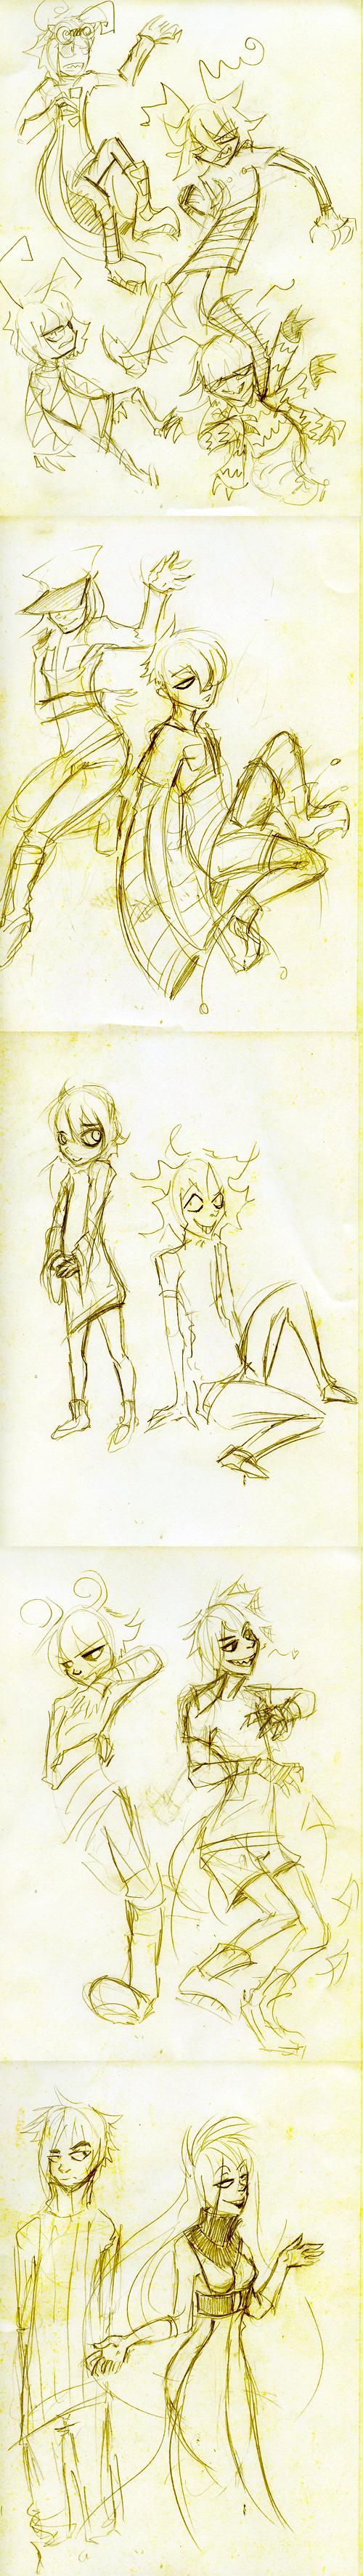 mini sketch dump by bergrimlo